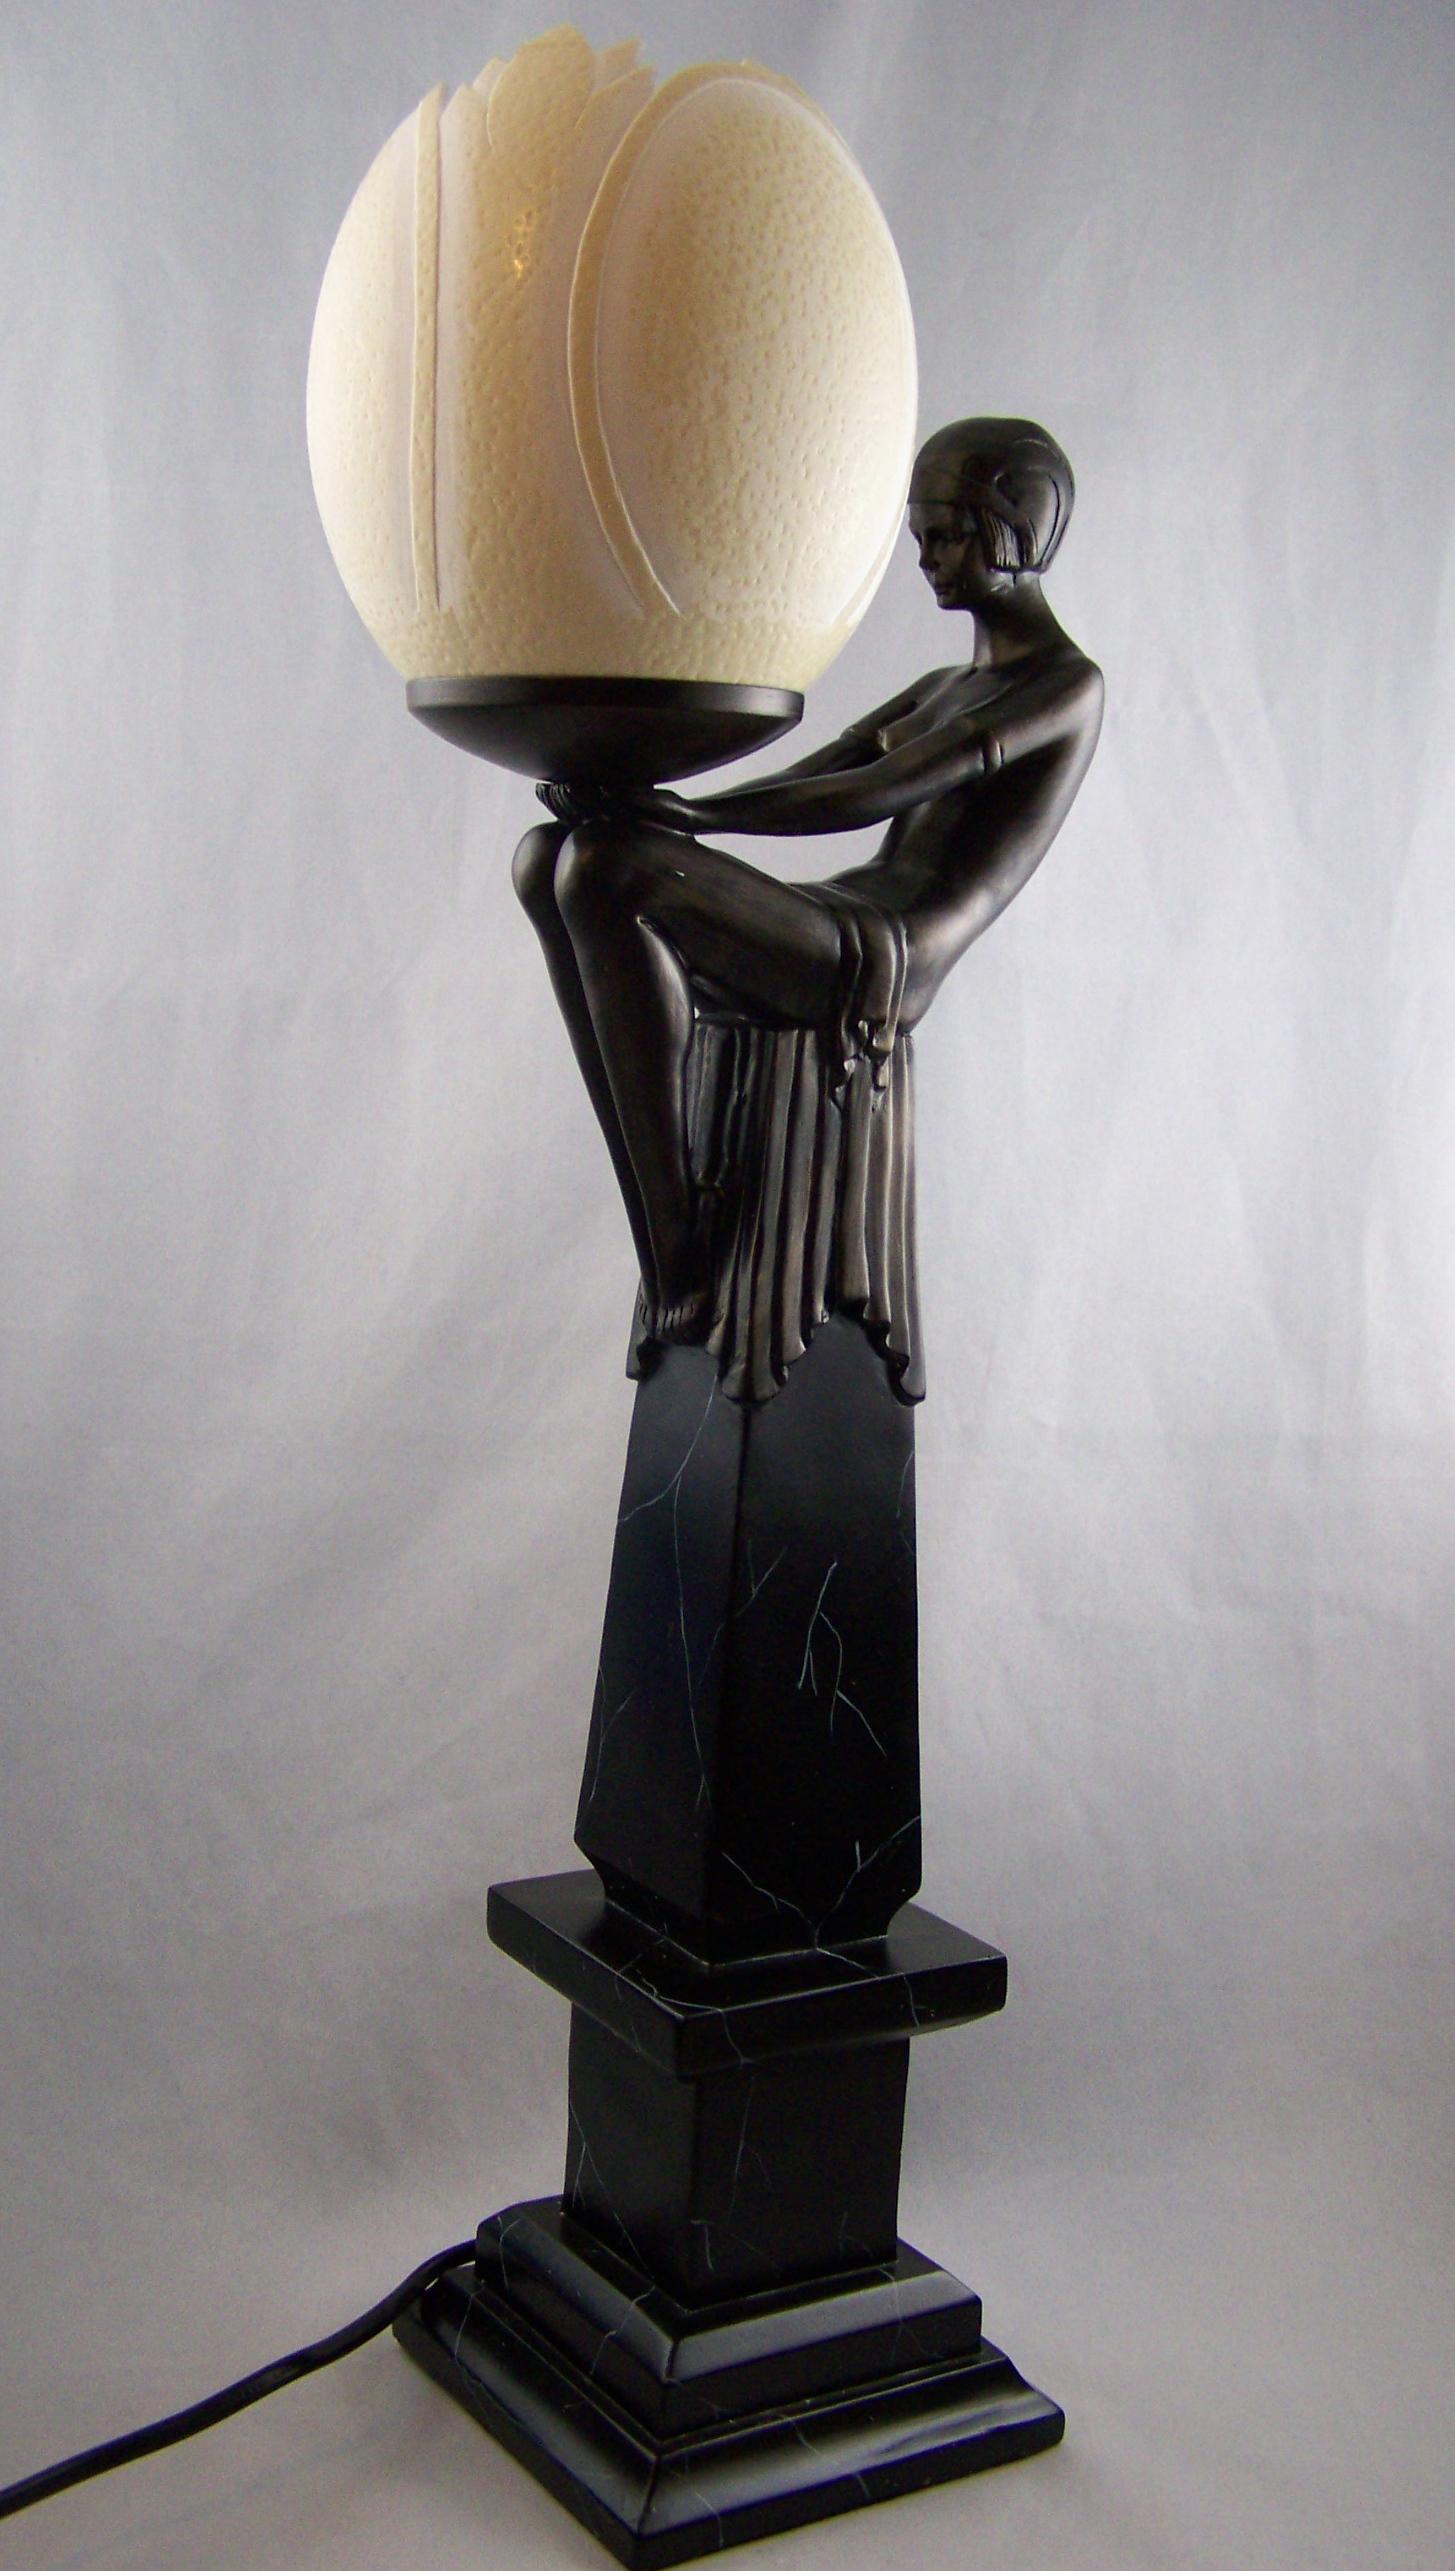 Art deco lampen tiffany lampen art deco lampen die for Design lampen nachbau